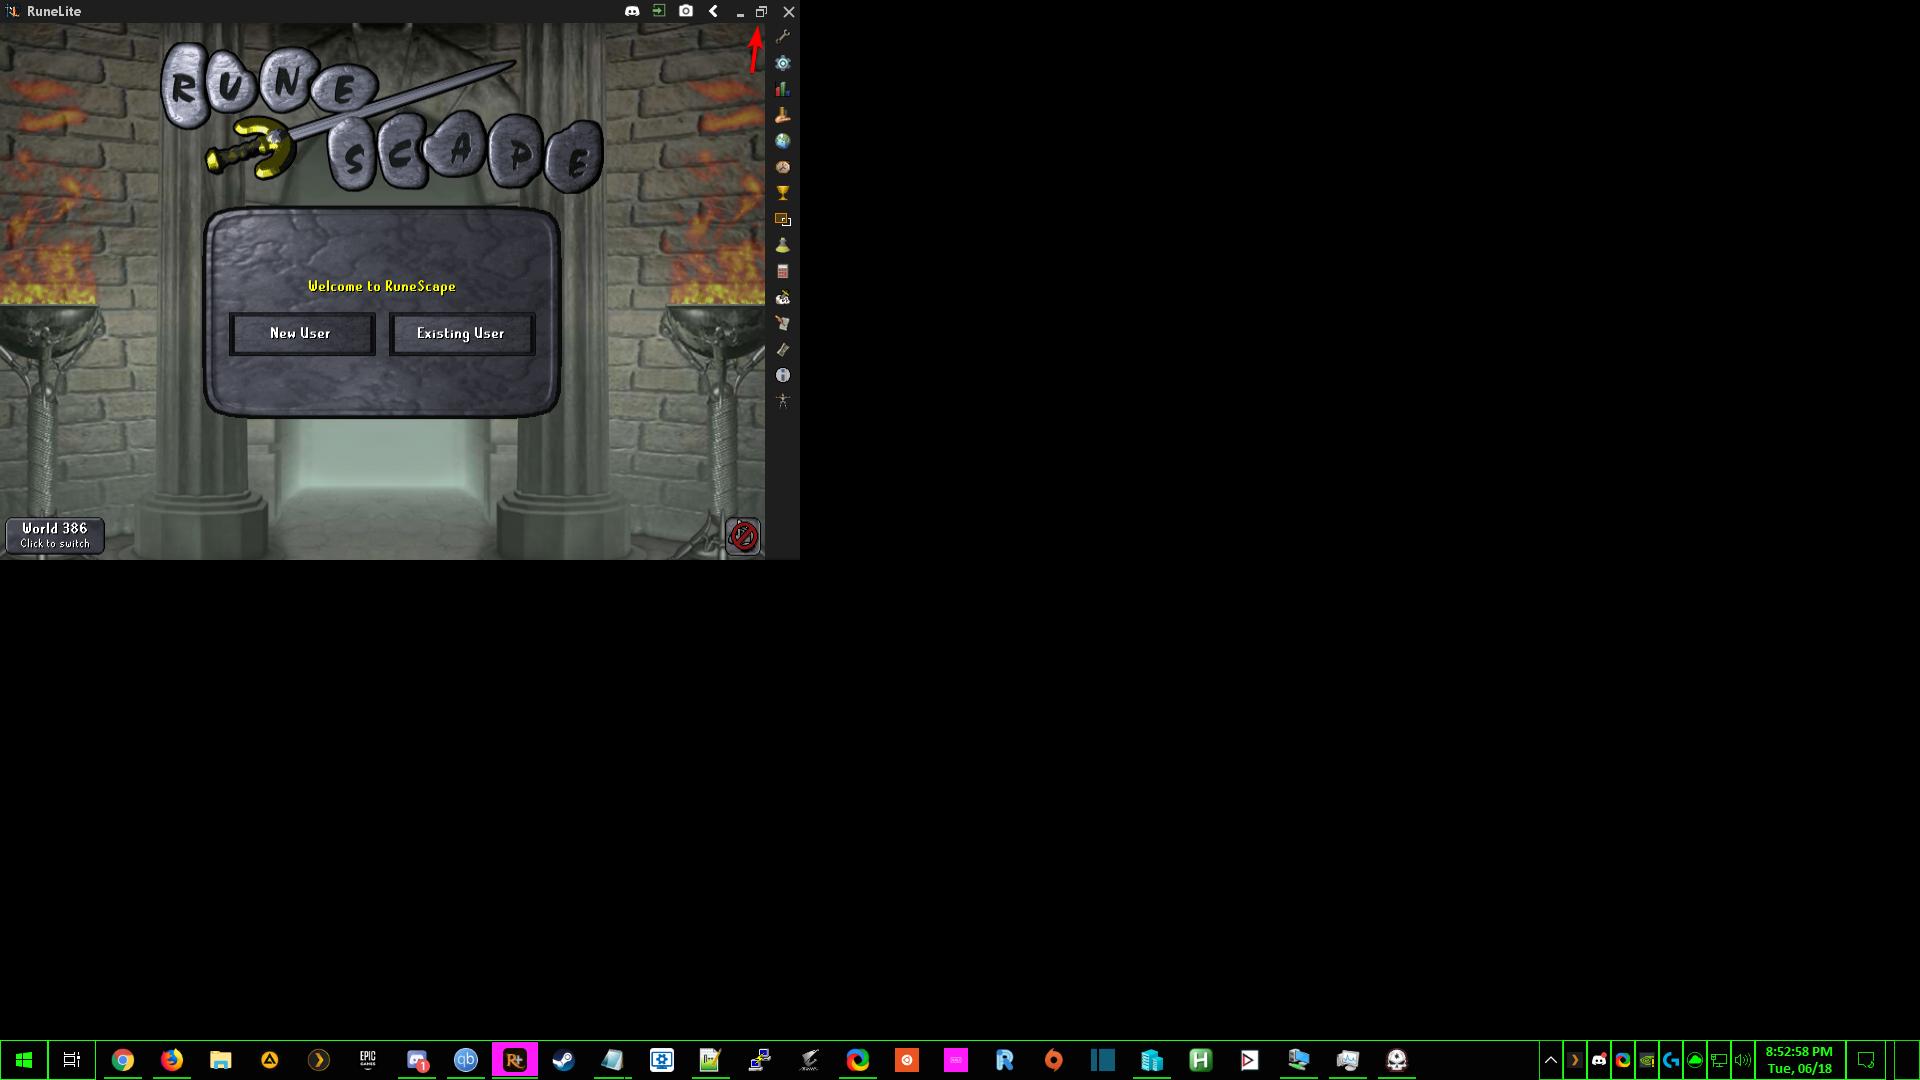 Runelite Linux